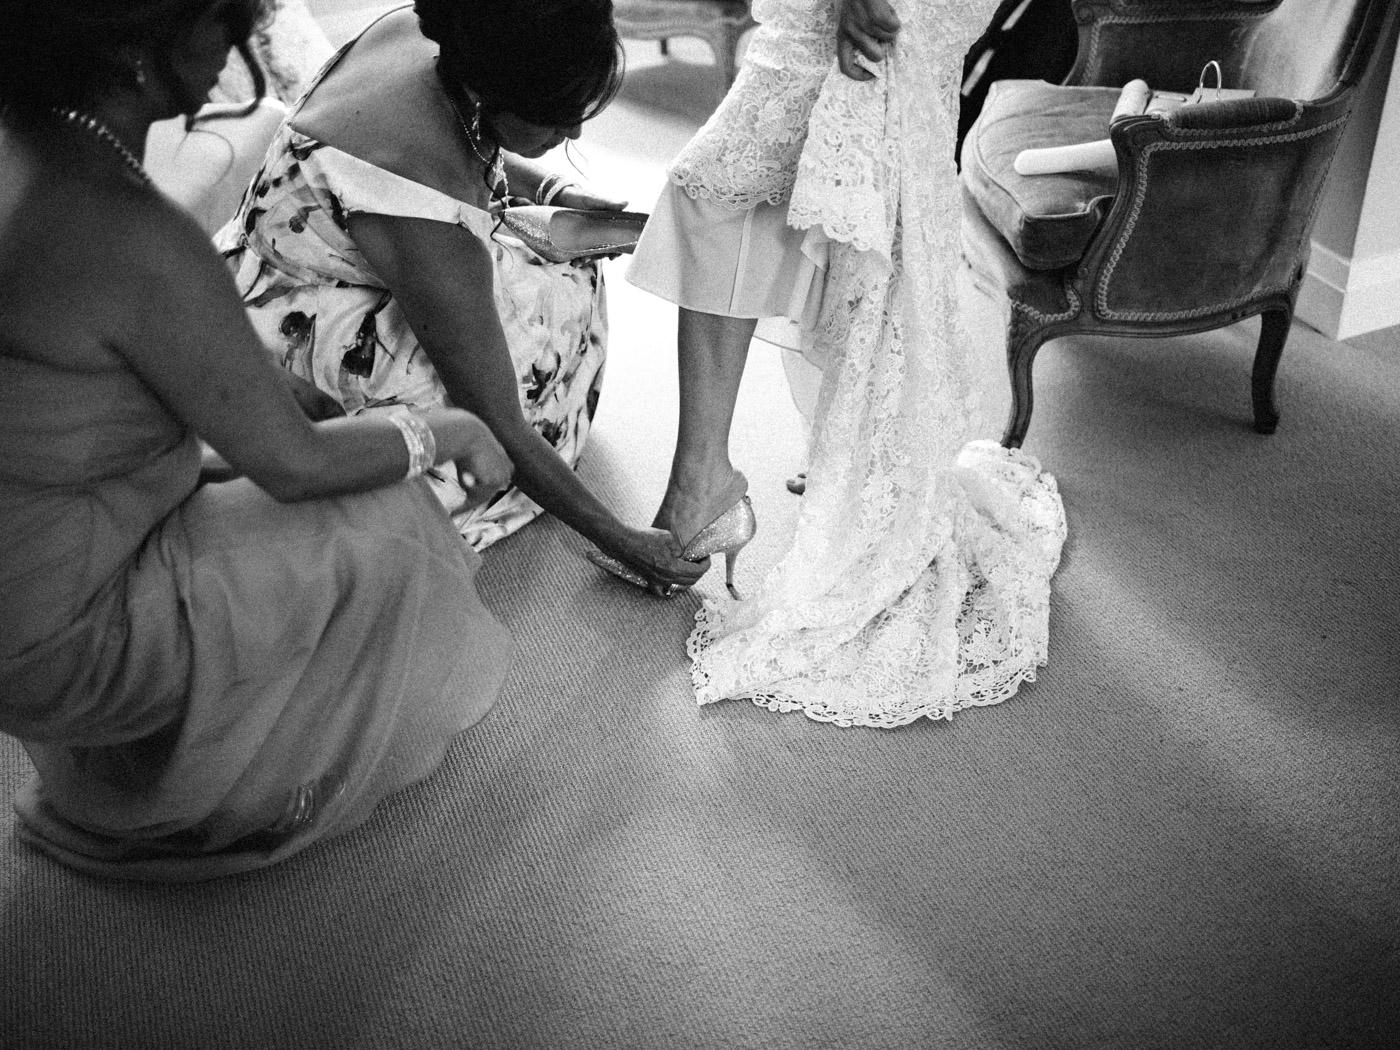 toronto_wedding_photographer_fine_art_documentary-70.jpg